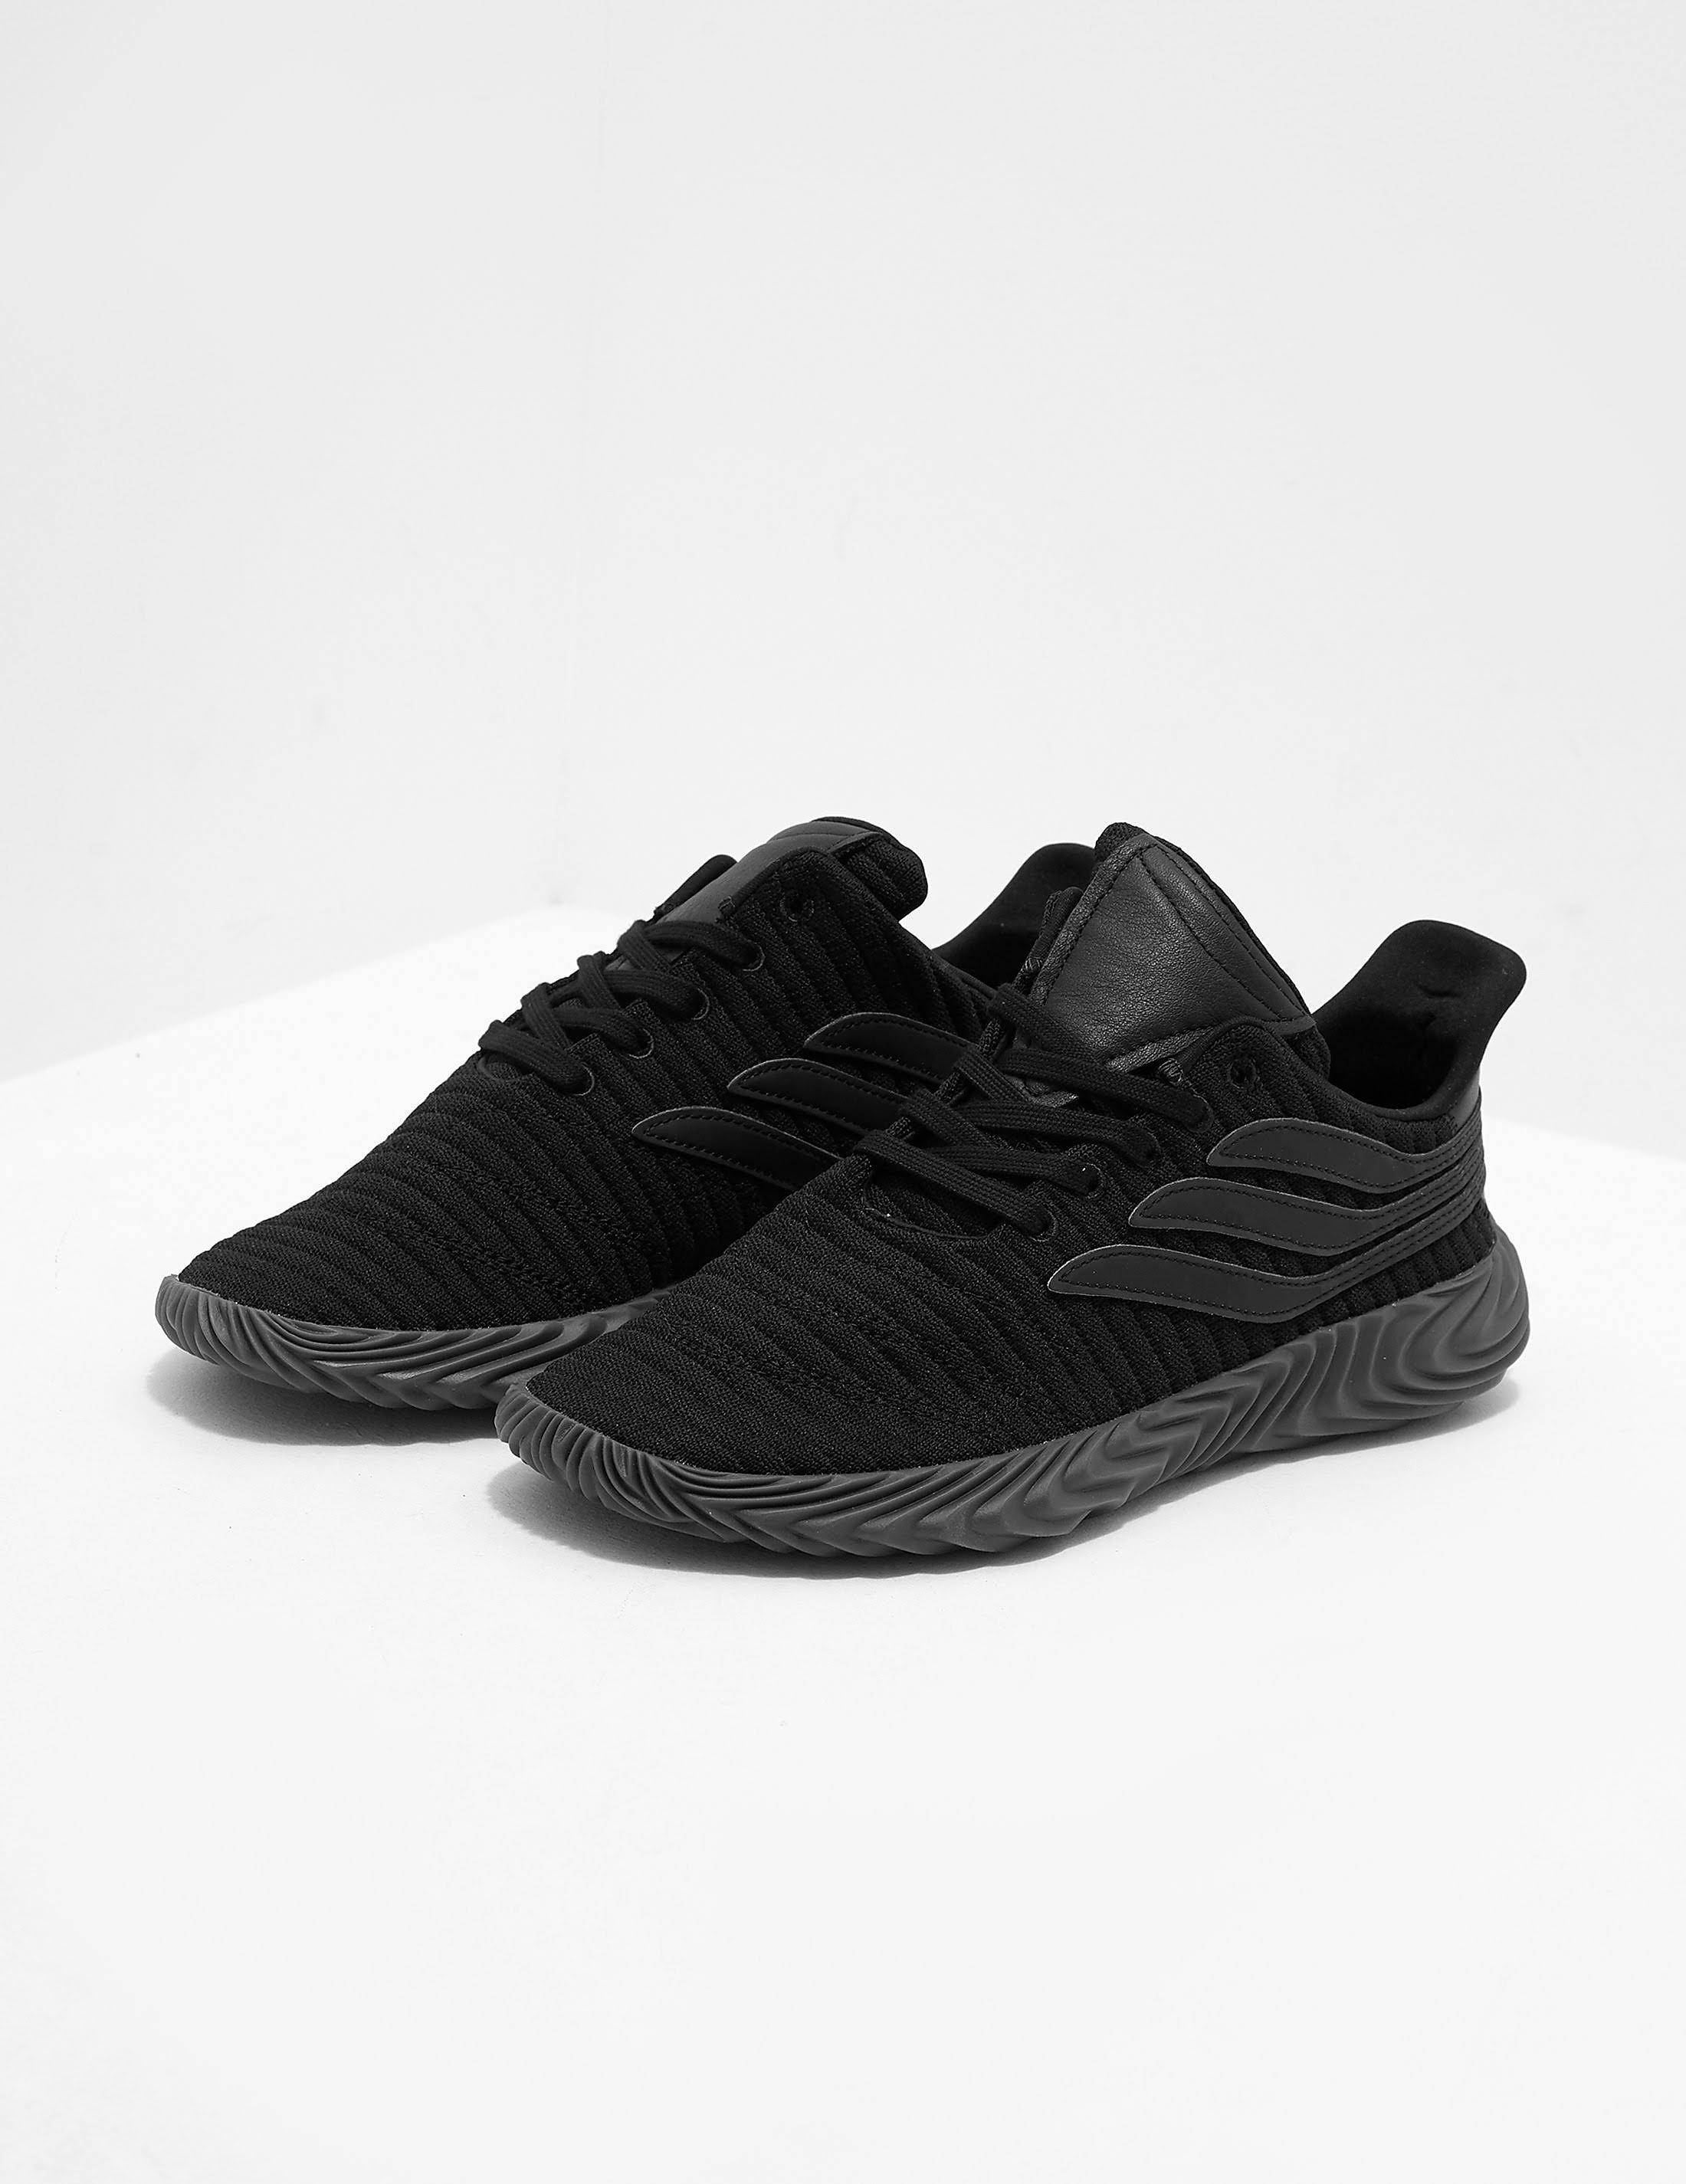 Negras Deportivas Sobakov Originals Adidas Hombre Zapatillas Para c1SR5tqWt